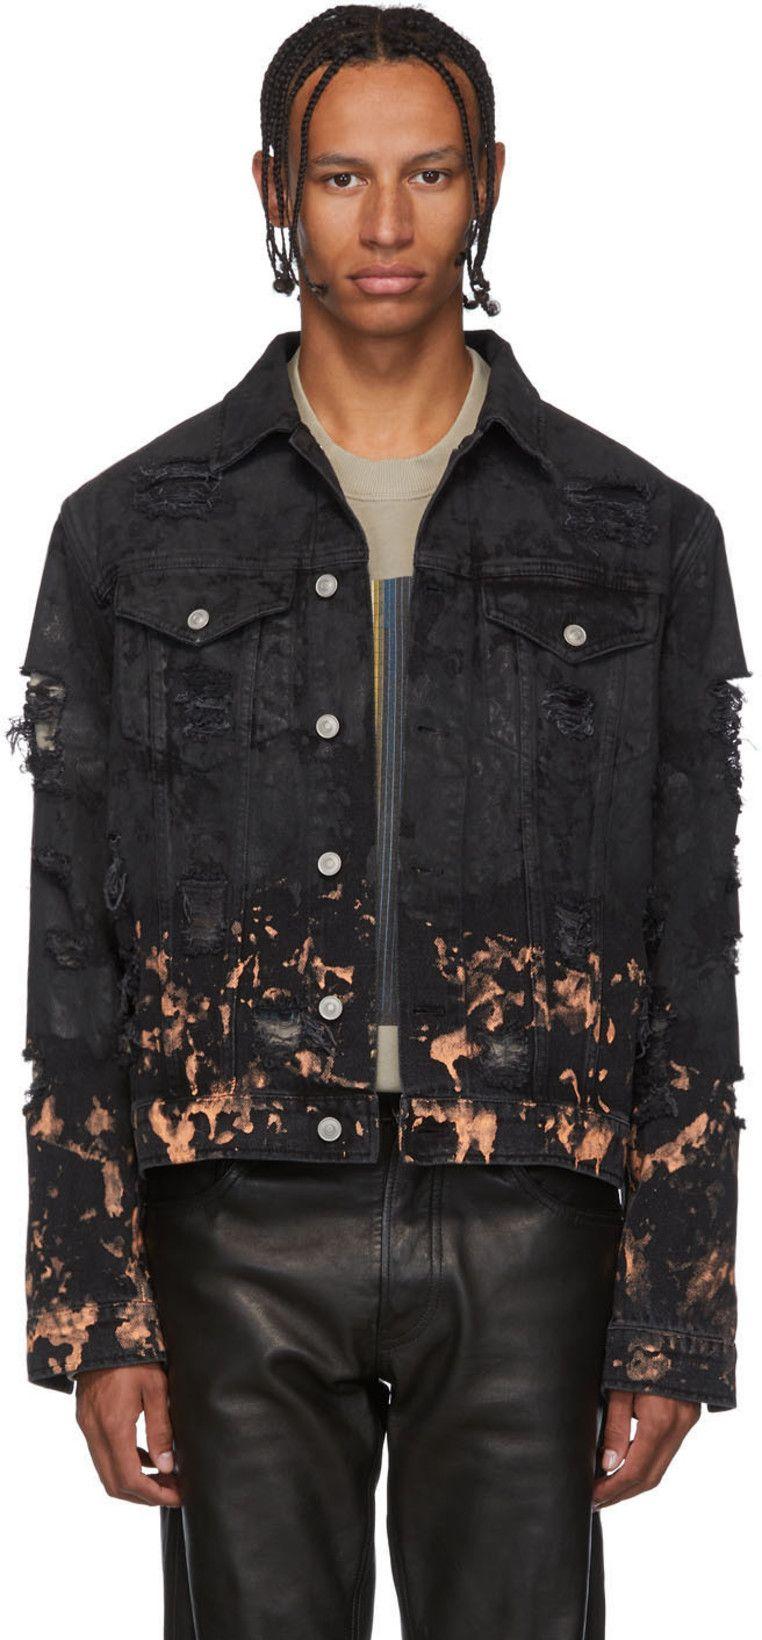 1017 Alyx 9sm Black Denim Ripped Jacket Ssense Ripped Jacket 1017 Alyx 9sm Jackets [ 1640 x 762 Pixel ]